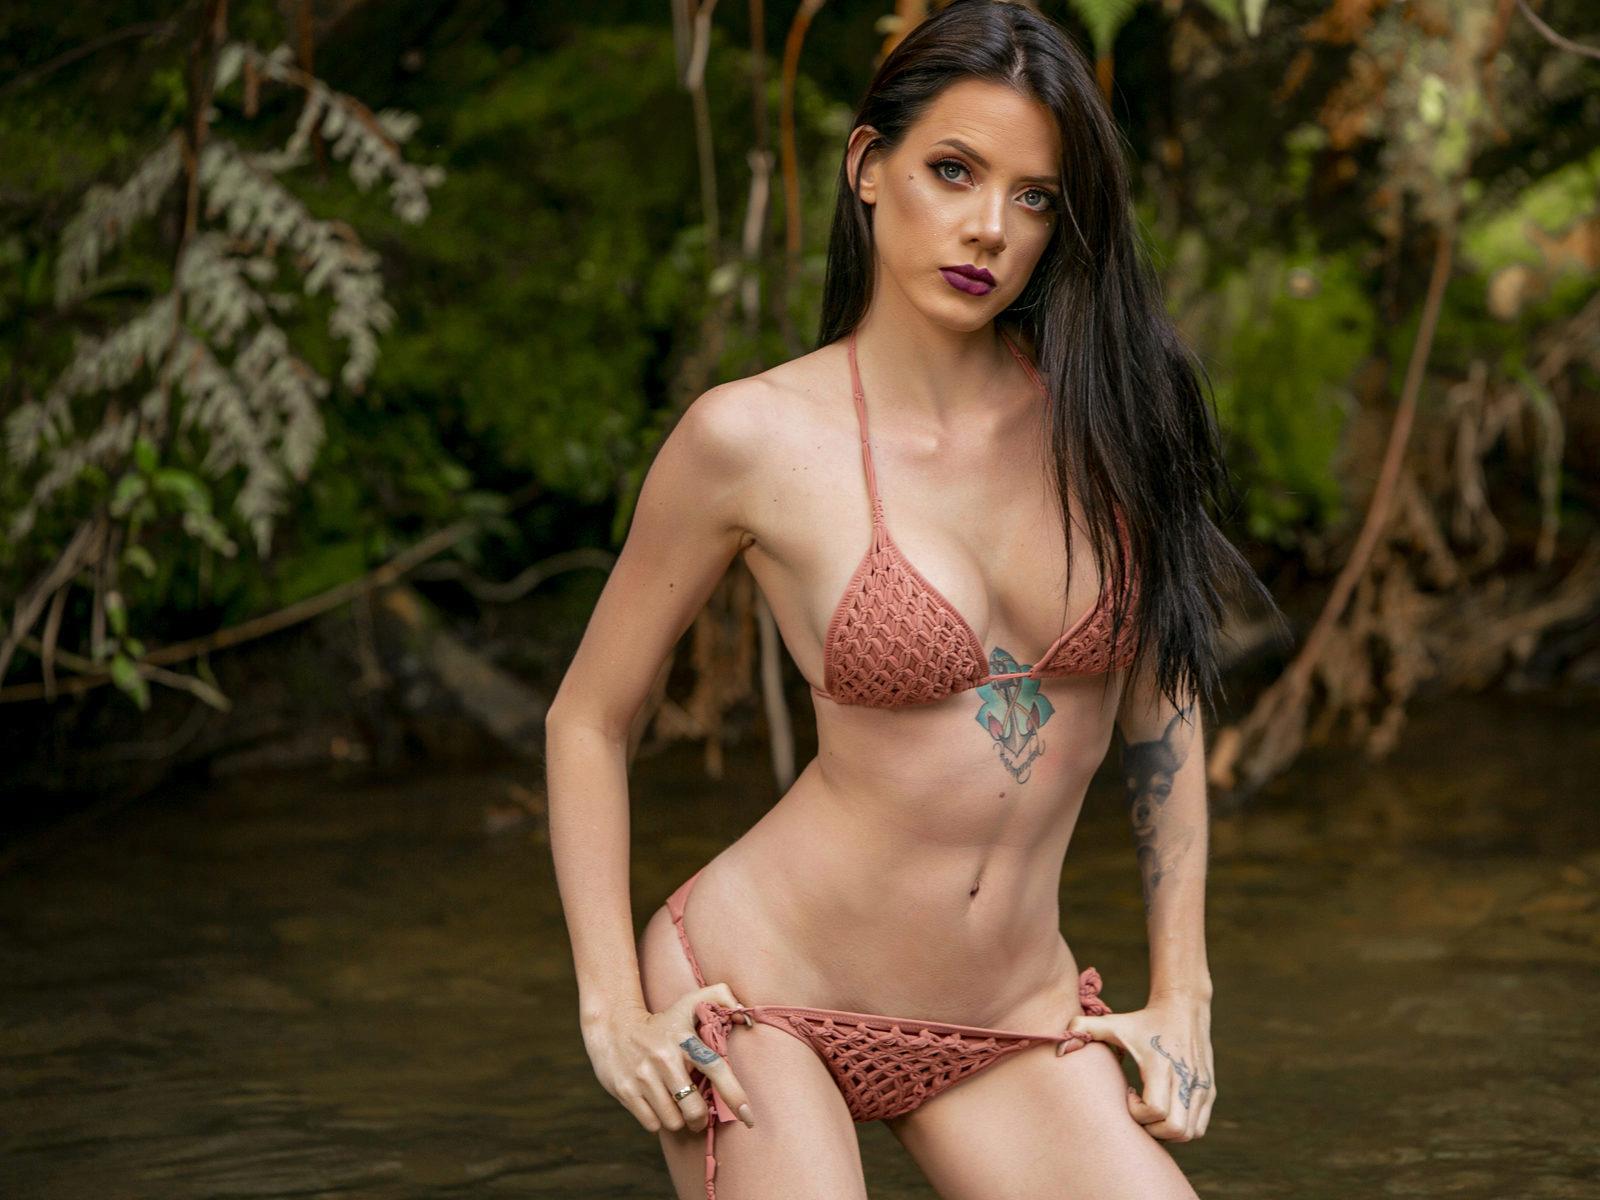 Kisha-tida-hottest-camgirl.jpg